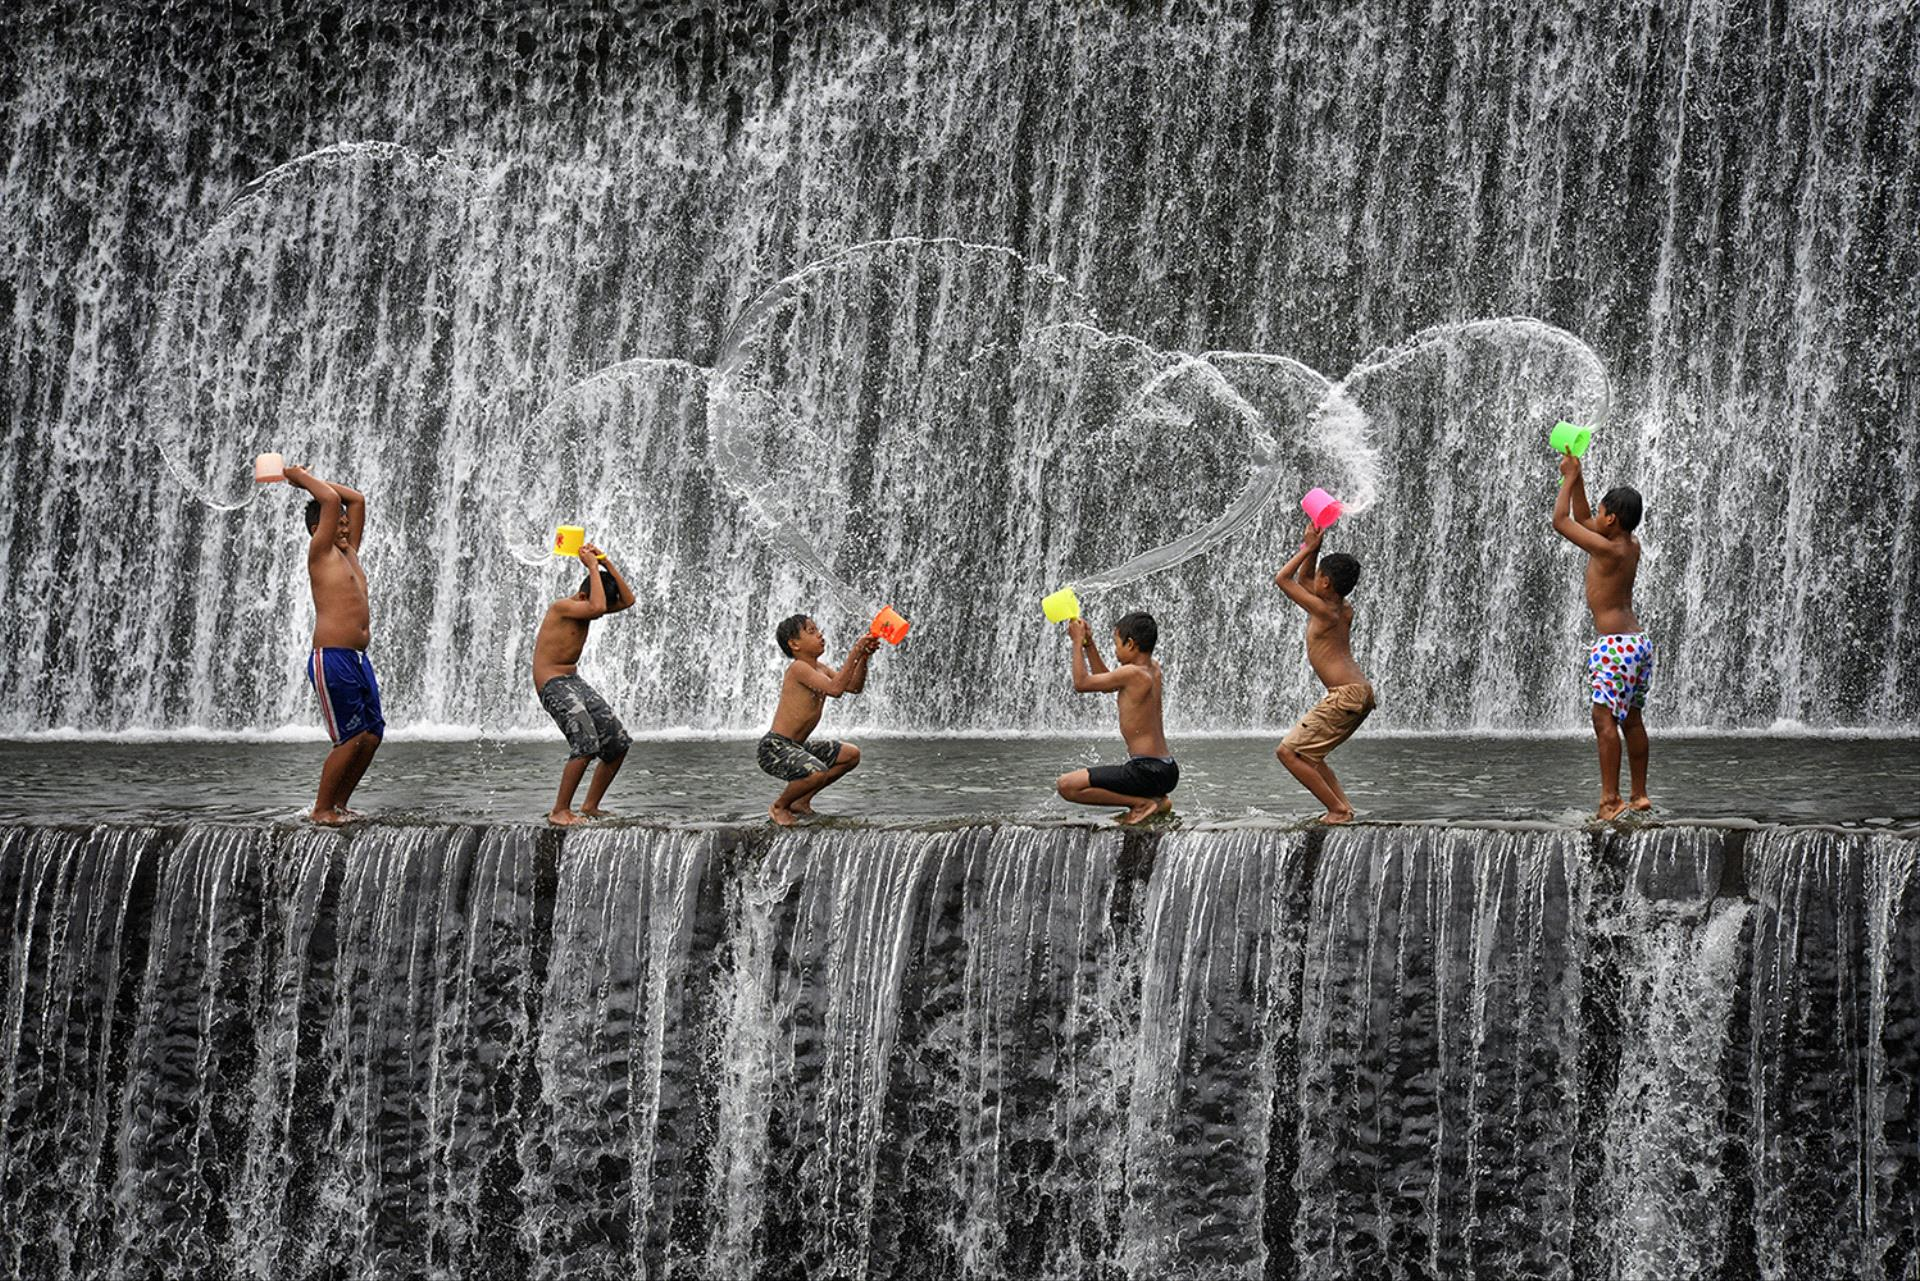 PSA HM Ribbons - Raymond Seh-Guan Goh (Singapore)  Tunkud Unda Splash